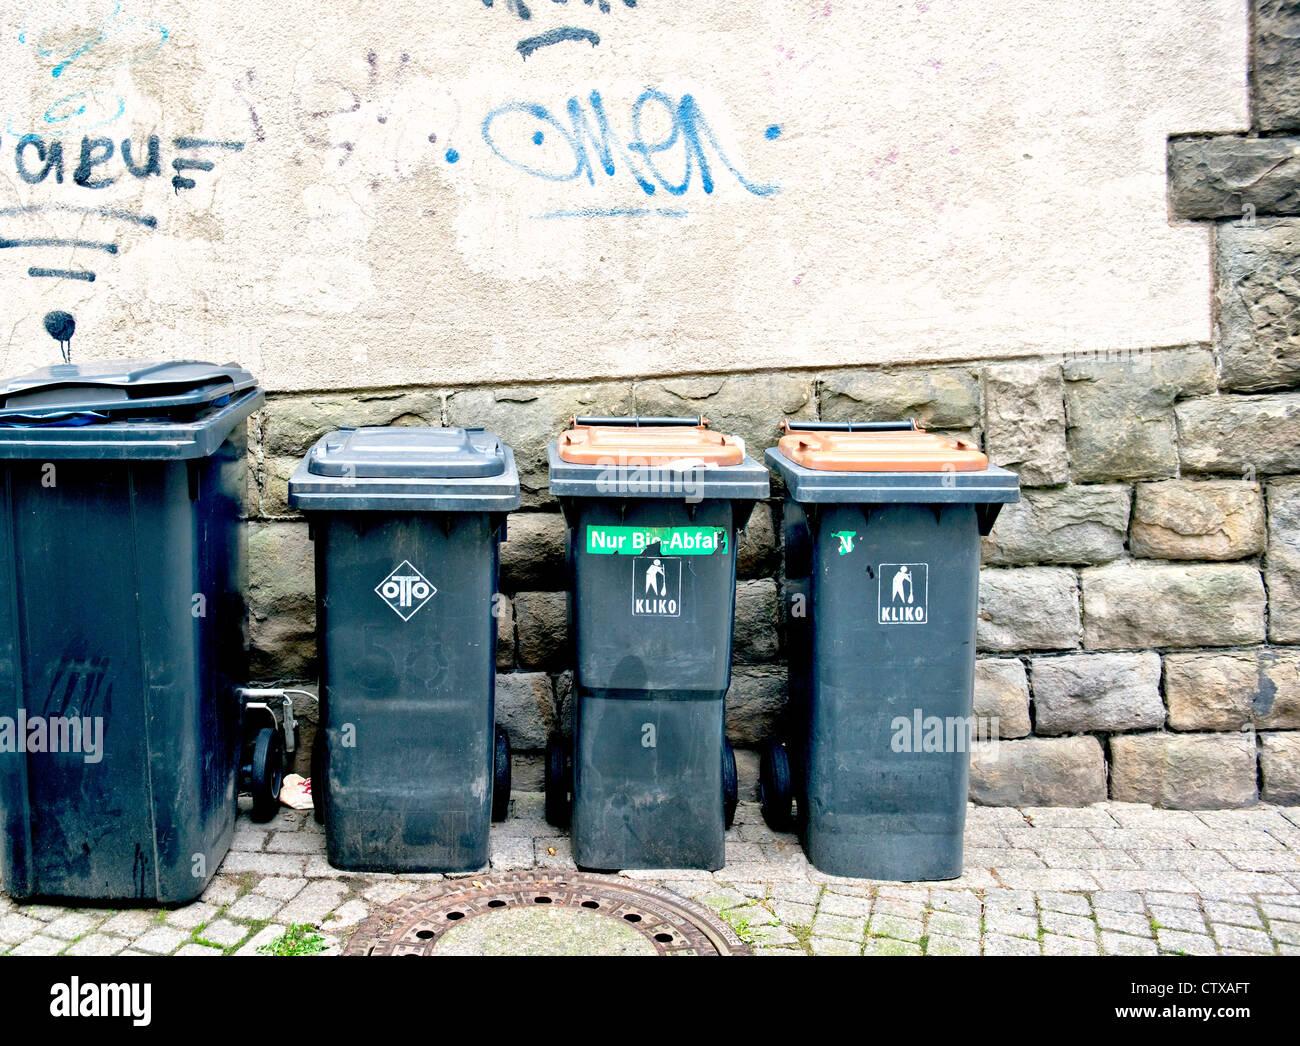 Dust bins in a backyard; muelltonnen im Hinterhof Stock Photo